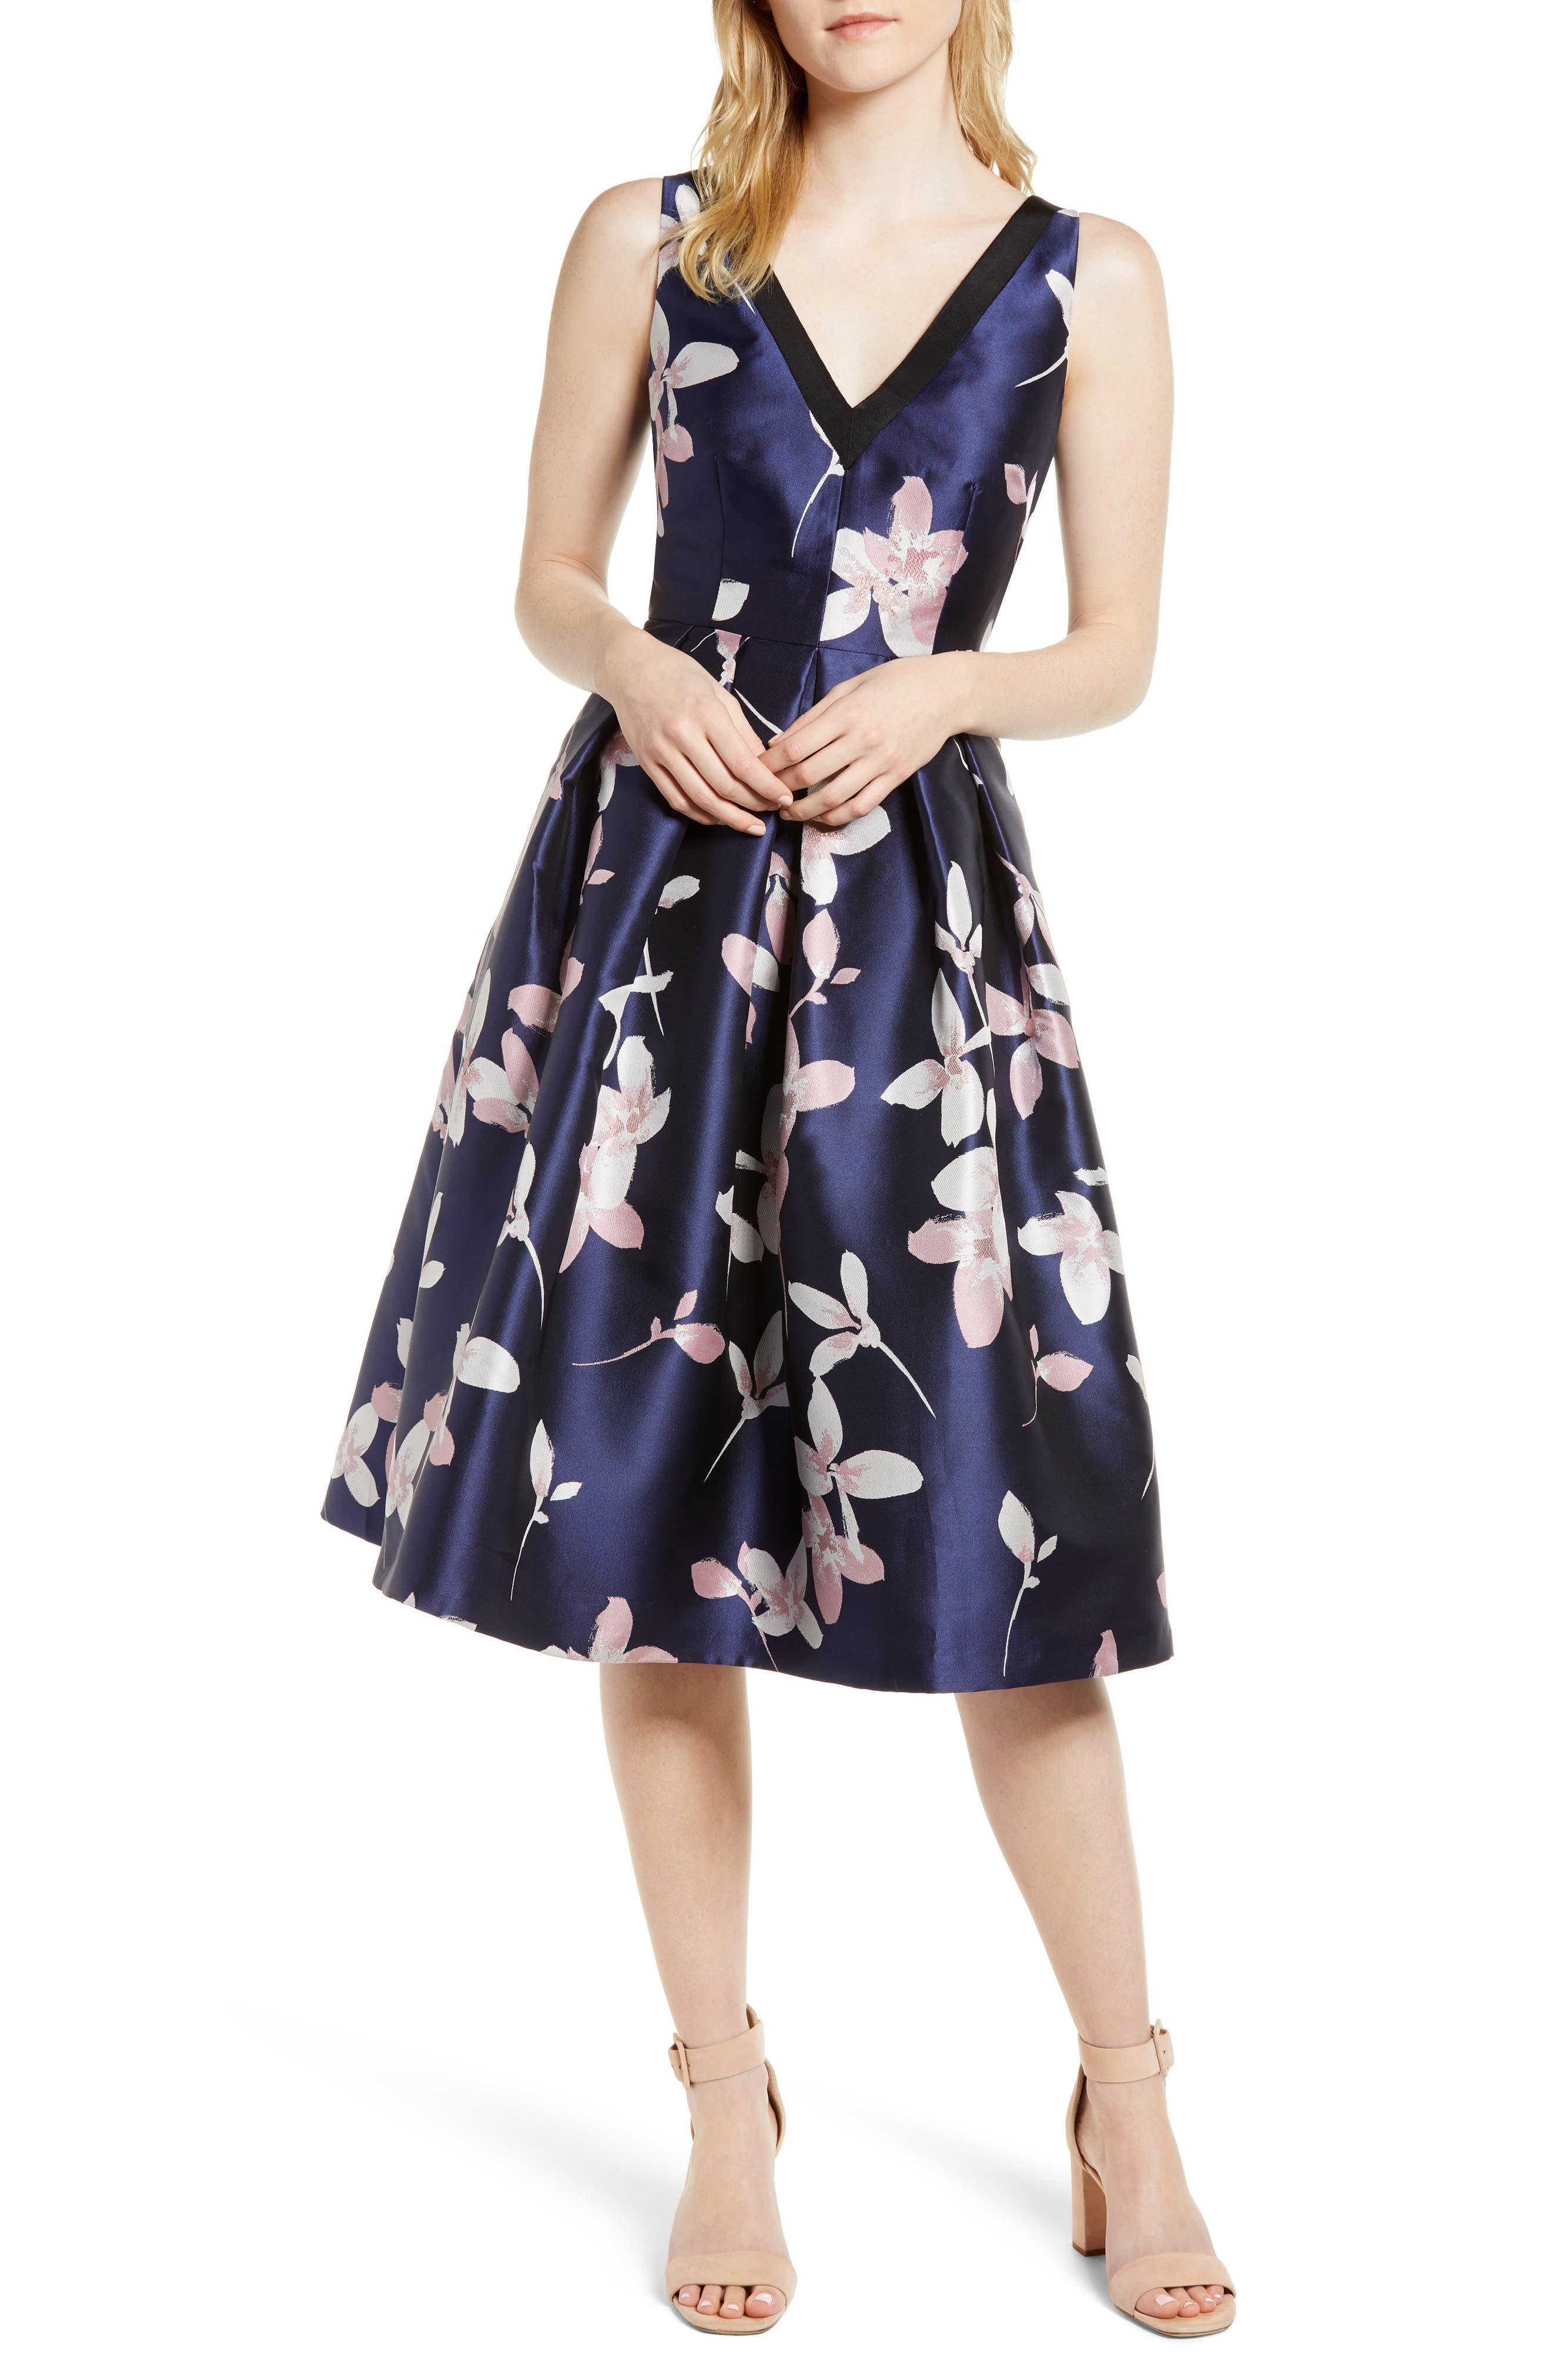 Floral Midi Cocktail Dress